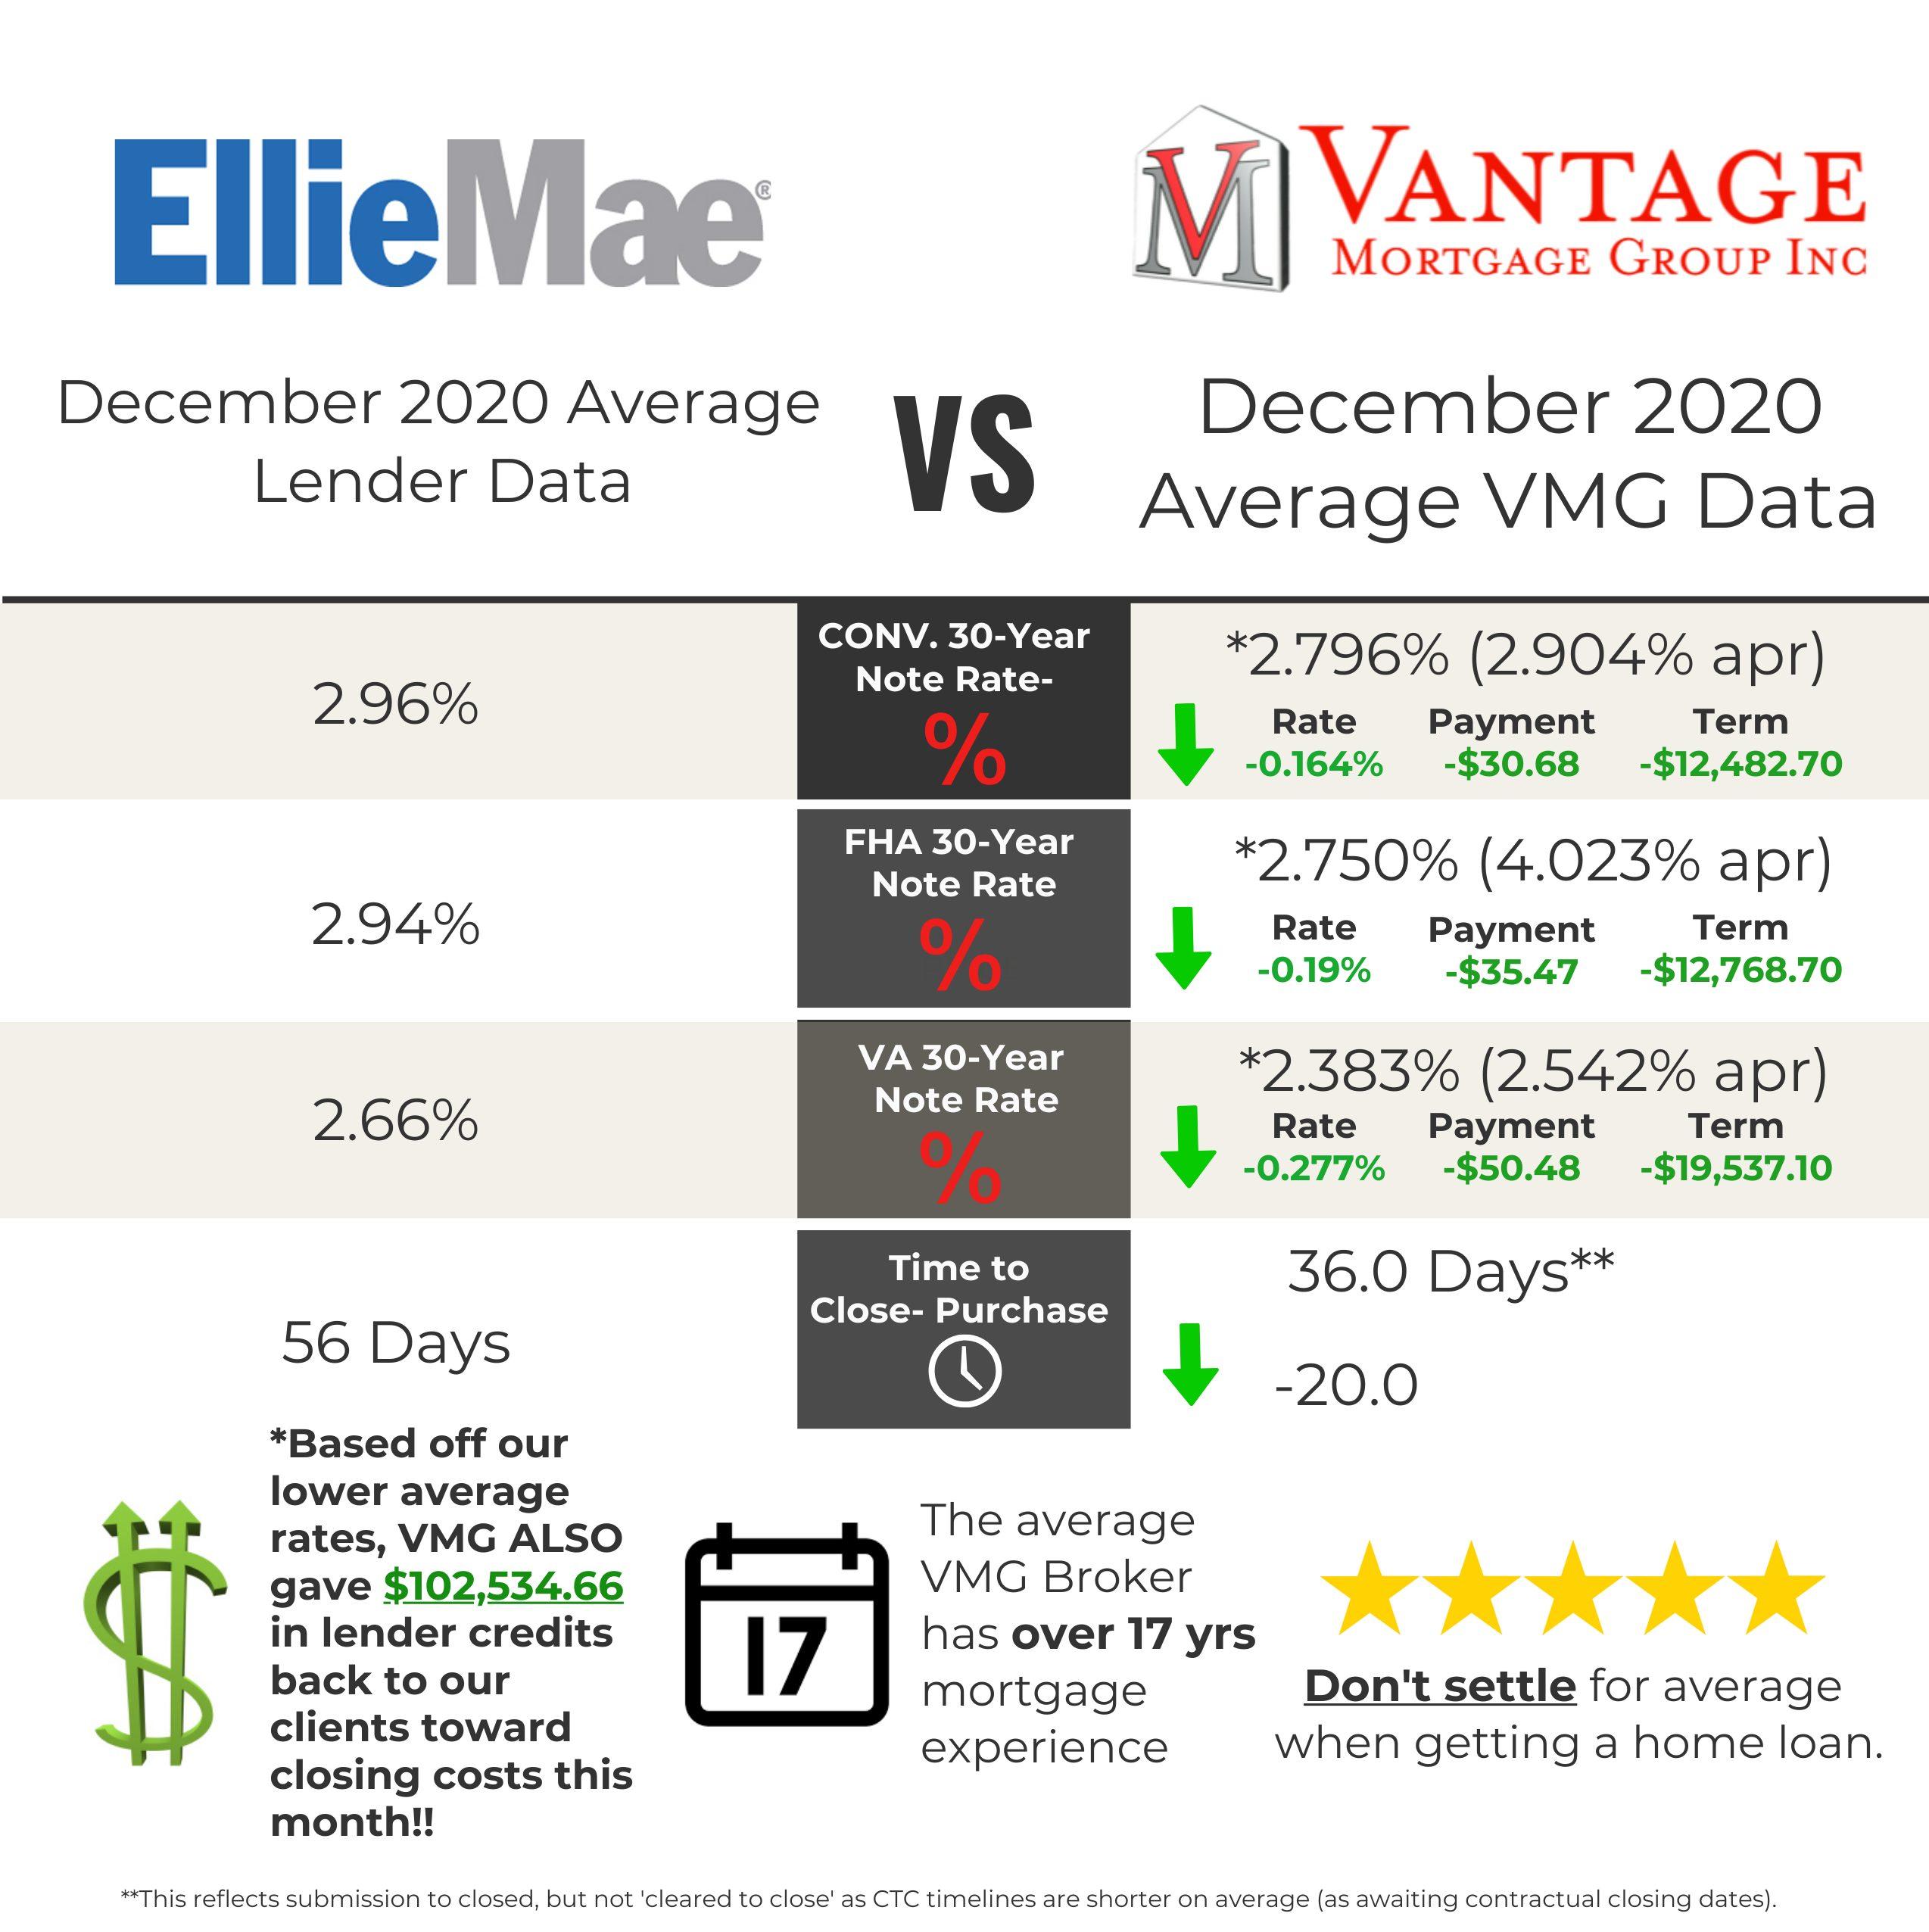 Compare Vantage